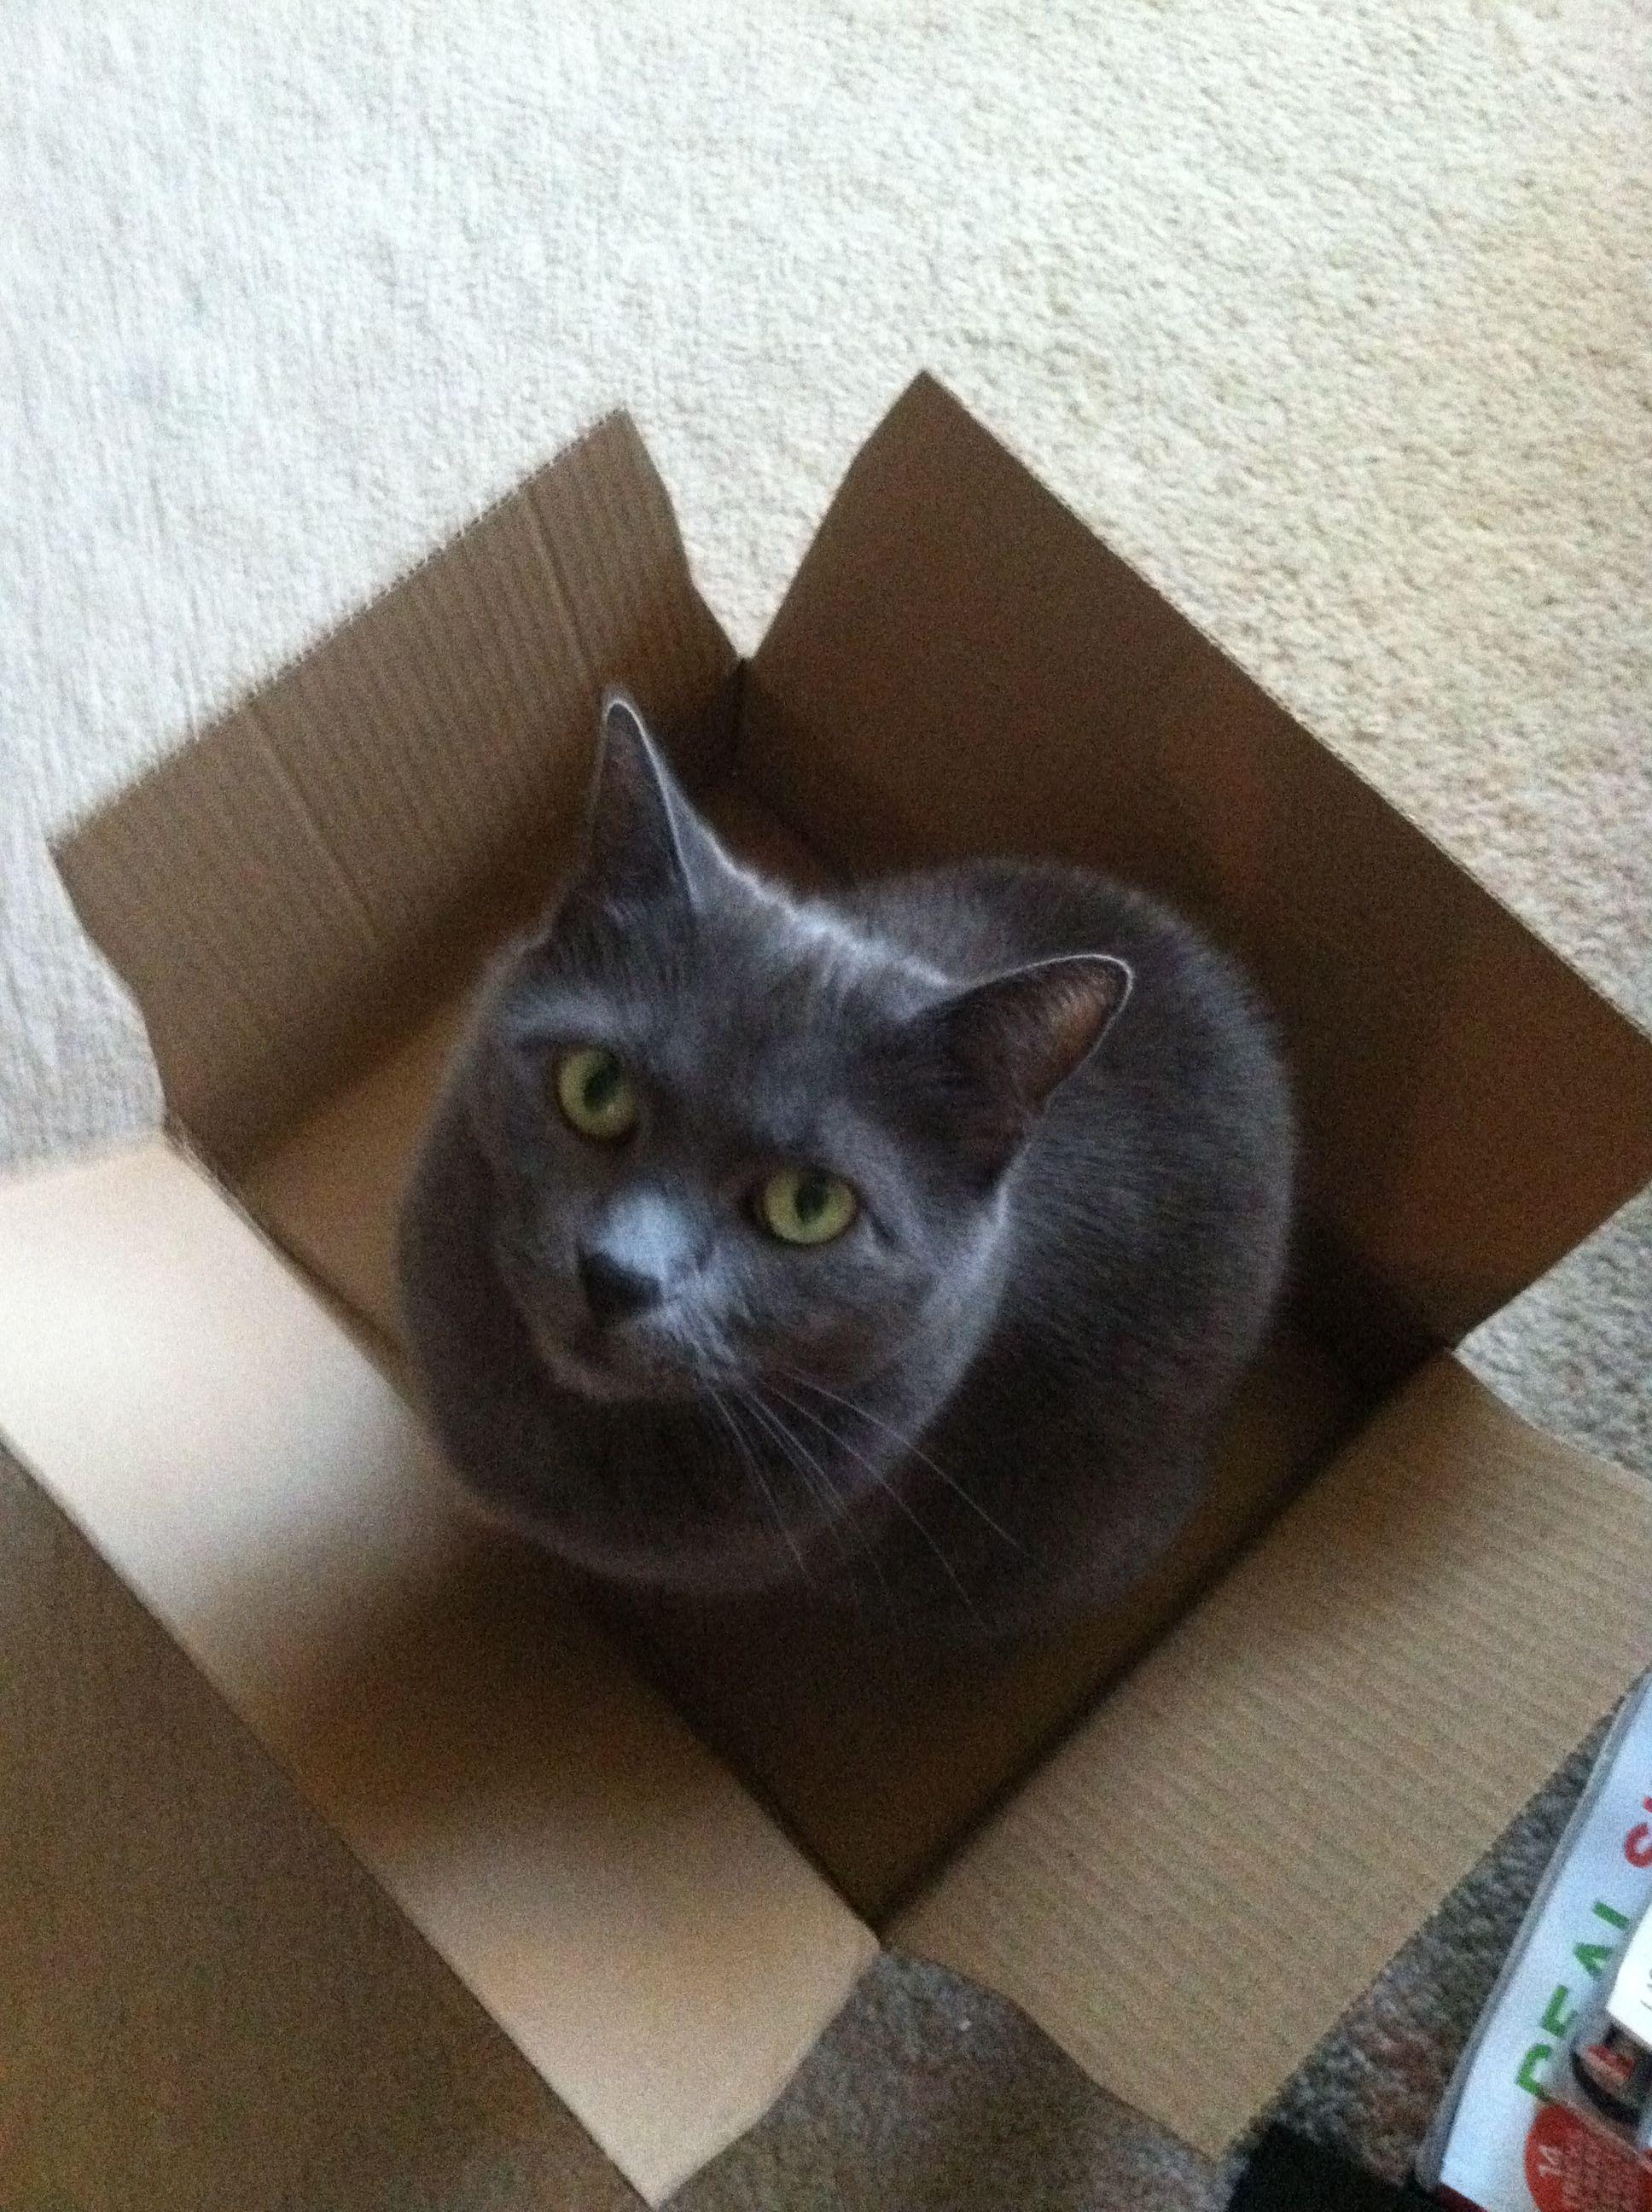 Cat In A Box Katze In Der Kiste Catinabox Cats Katzen Cats Cat Box Cat Love